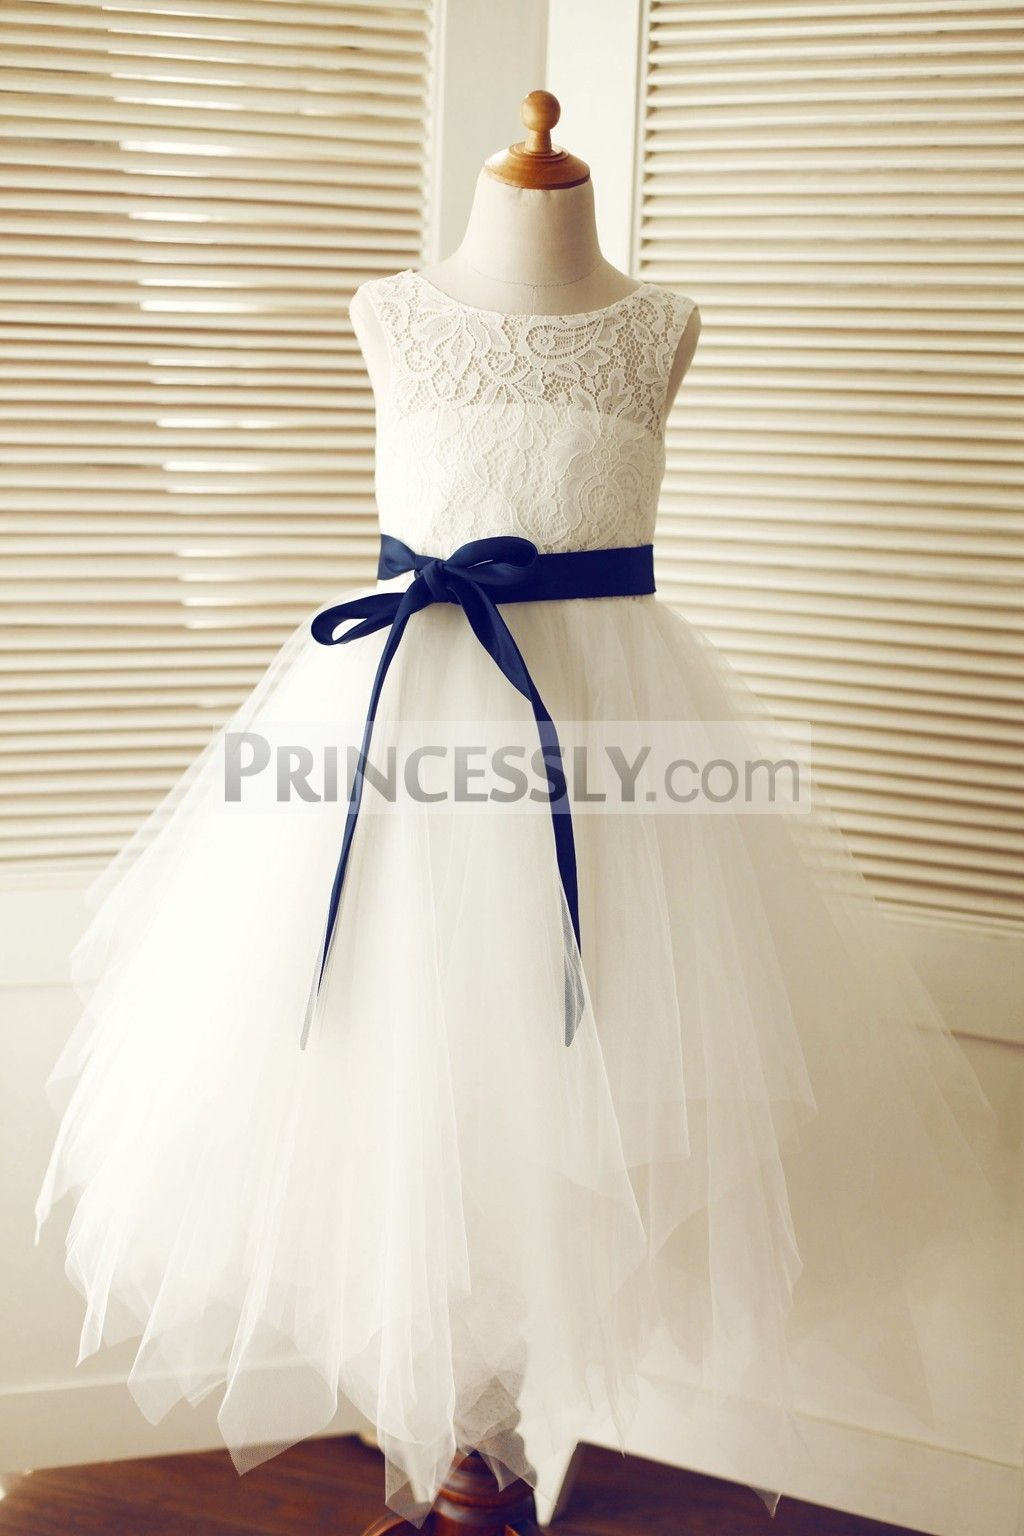 Keyhole ivory lace tulle wedding flower girl dressnavy blue sash in